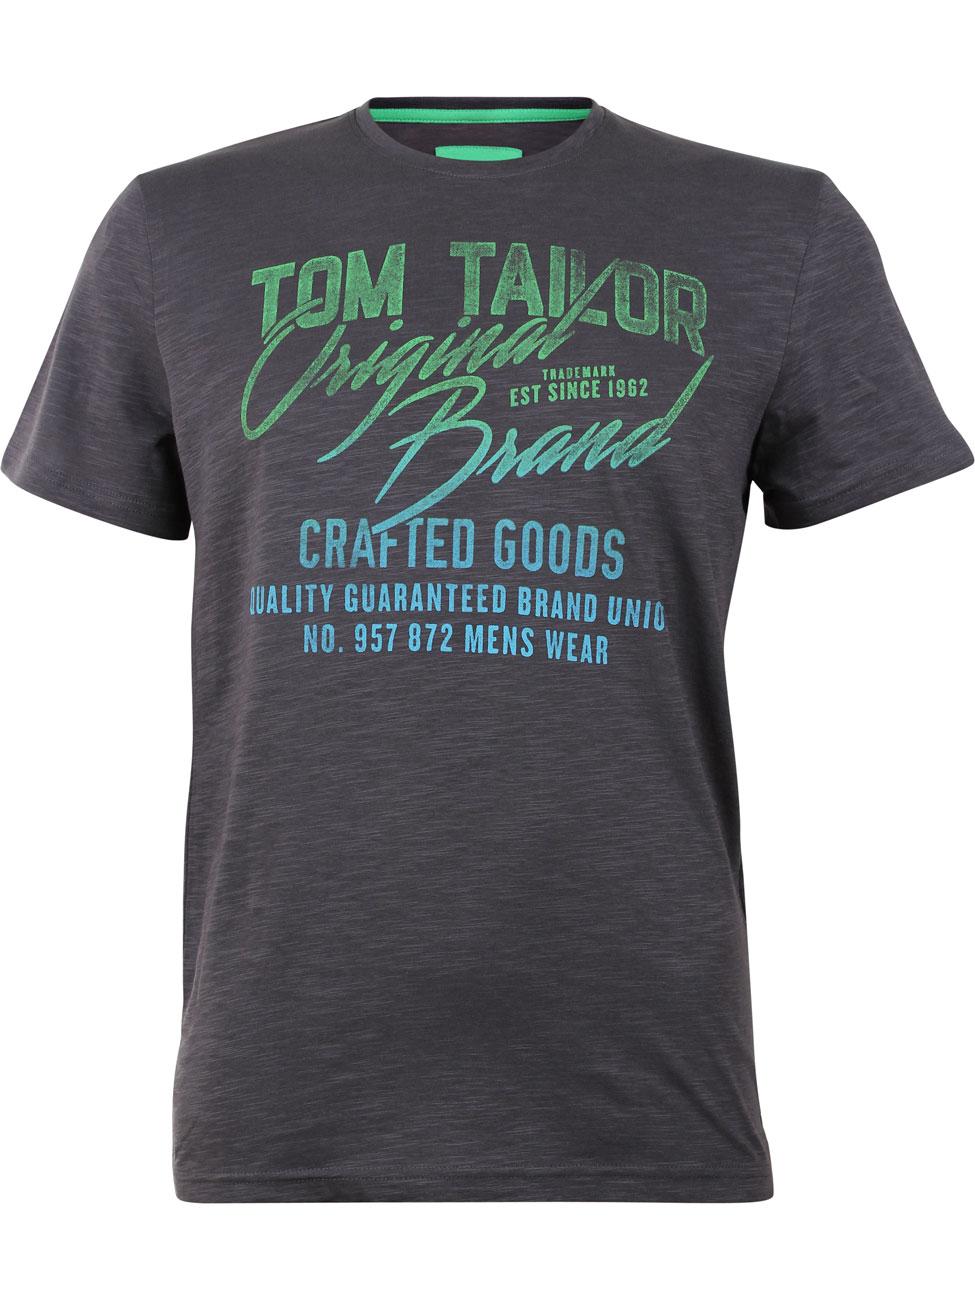 Tom Tailor Herren T-Shirt mit Wording Print L, Tarmac Grey (2983)